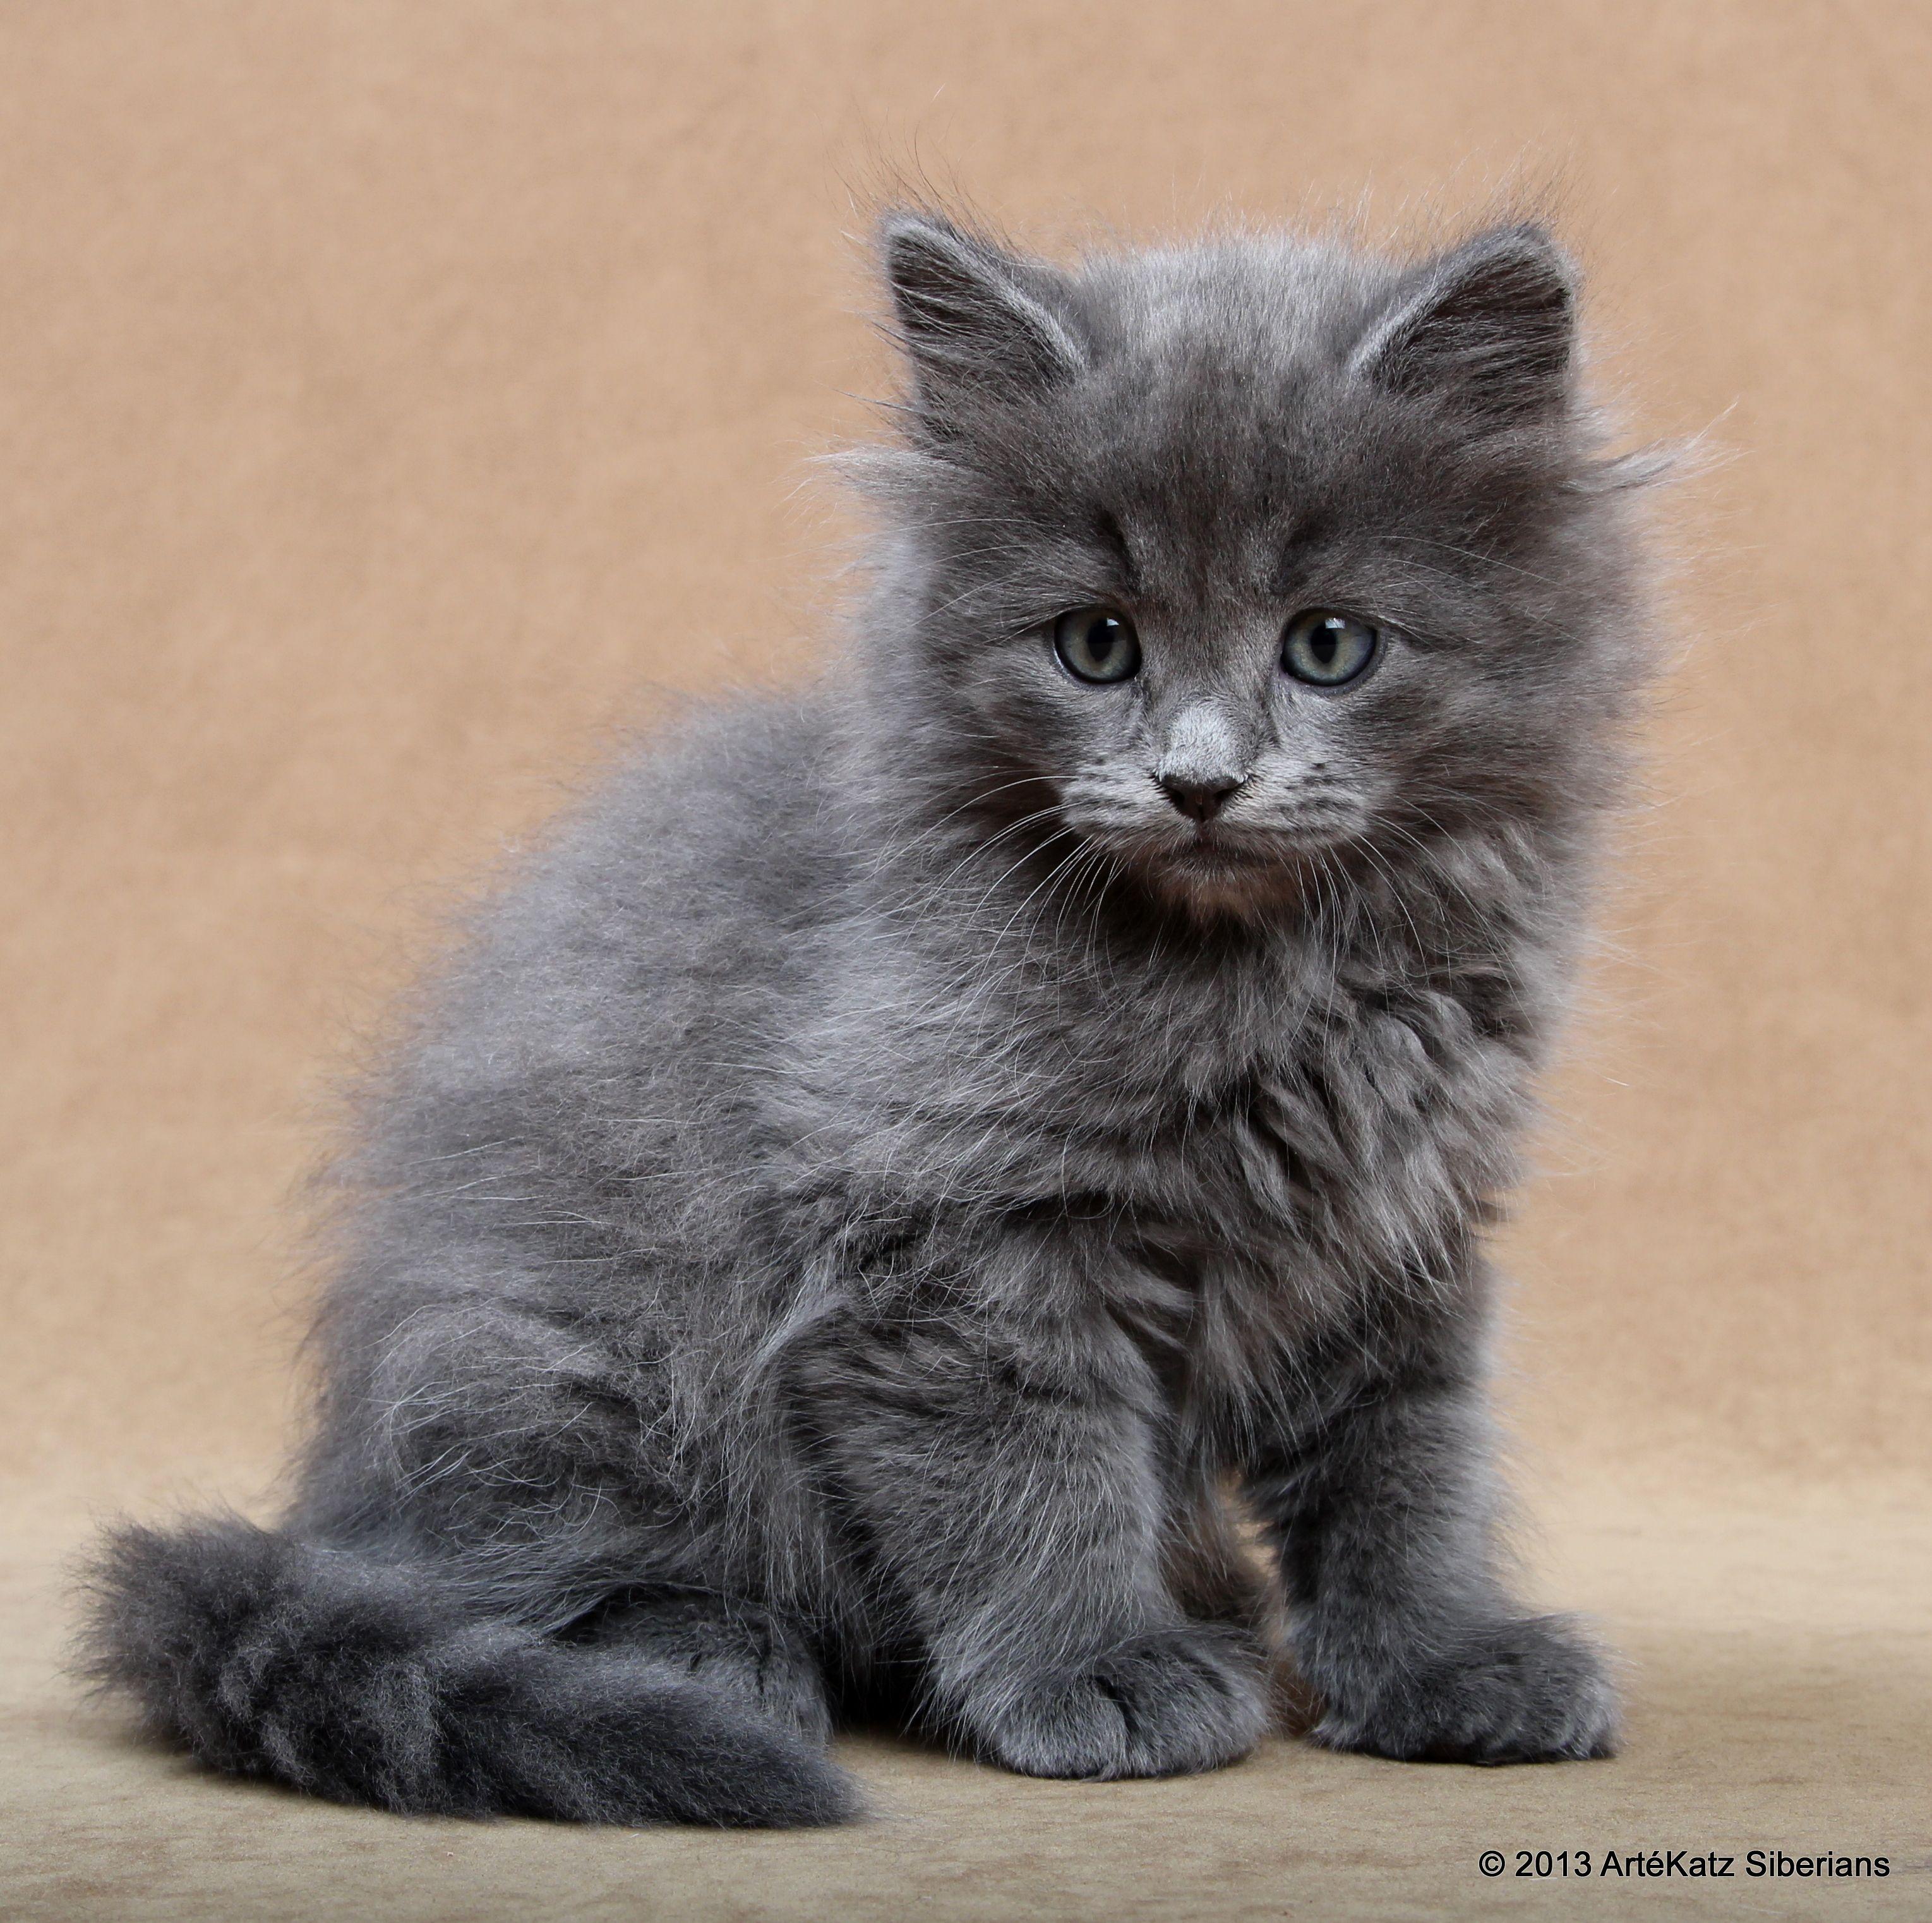 Eddie, my blue Siberian kitten